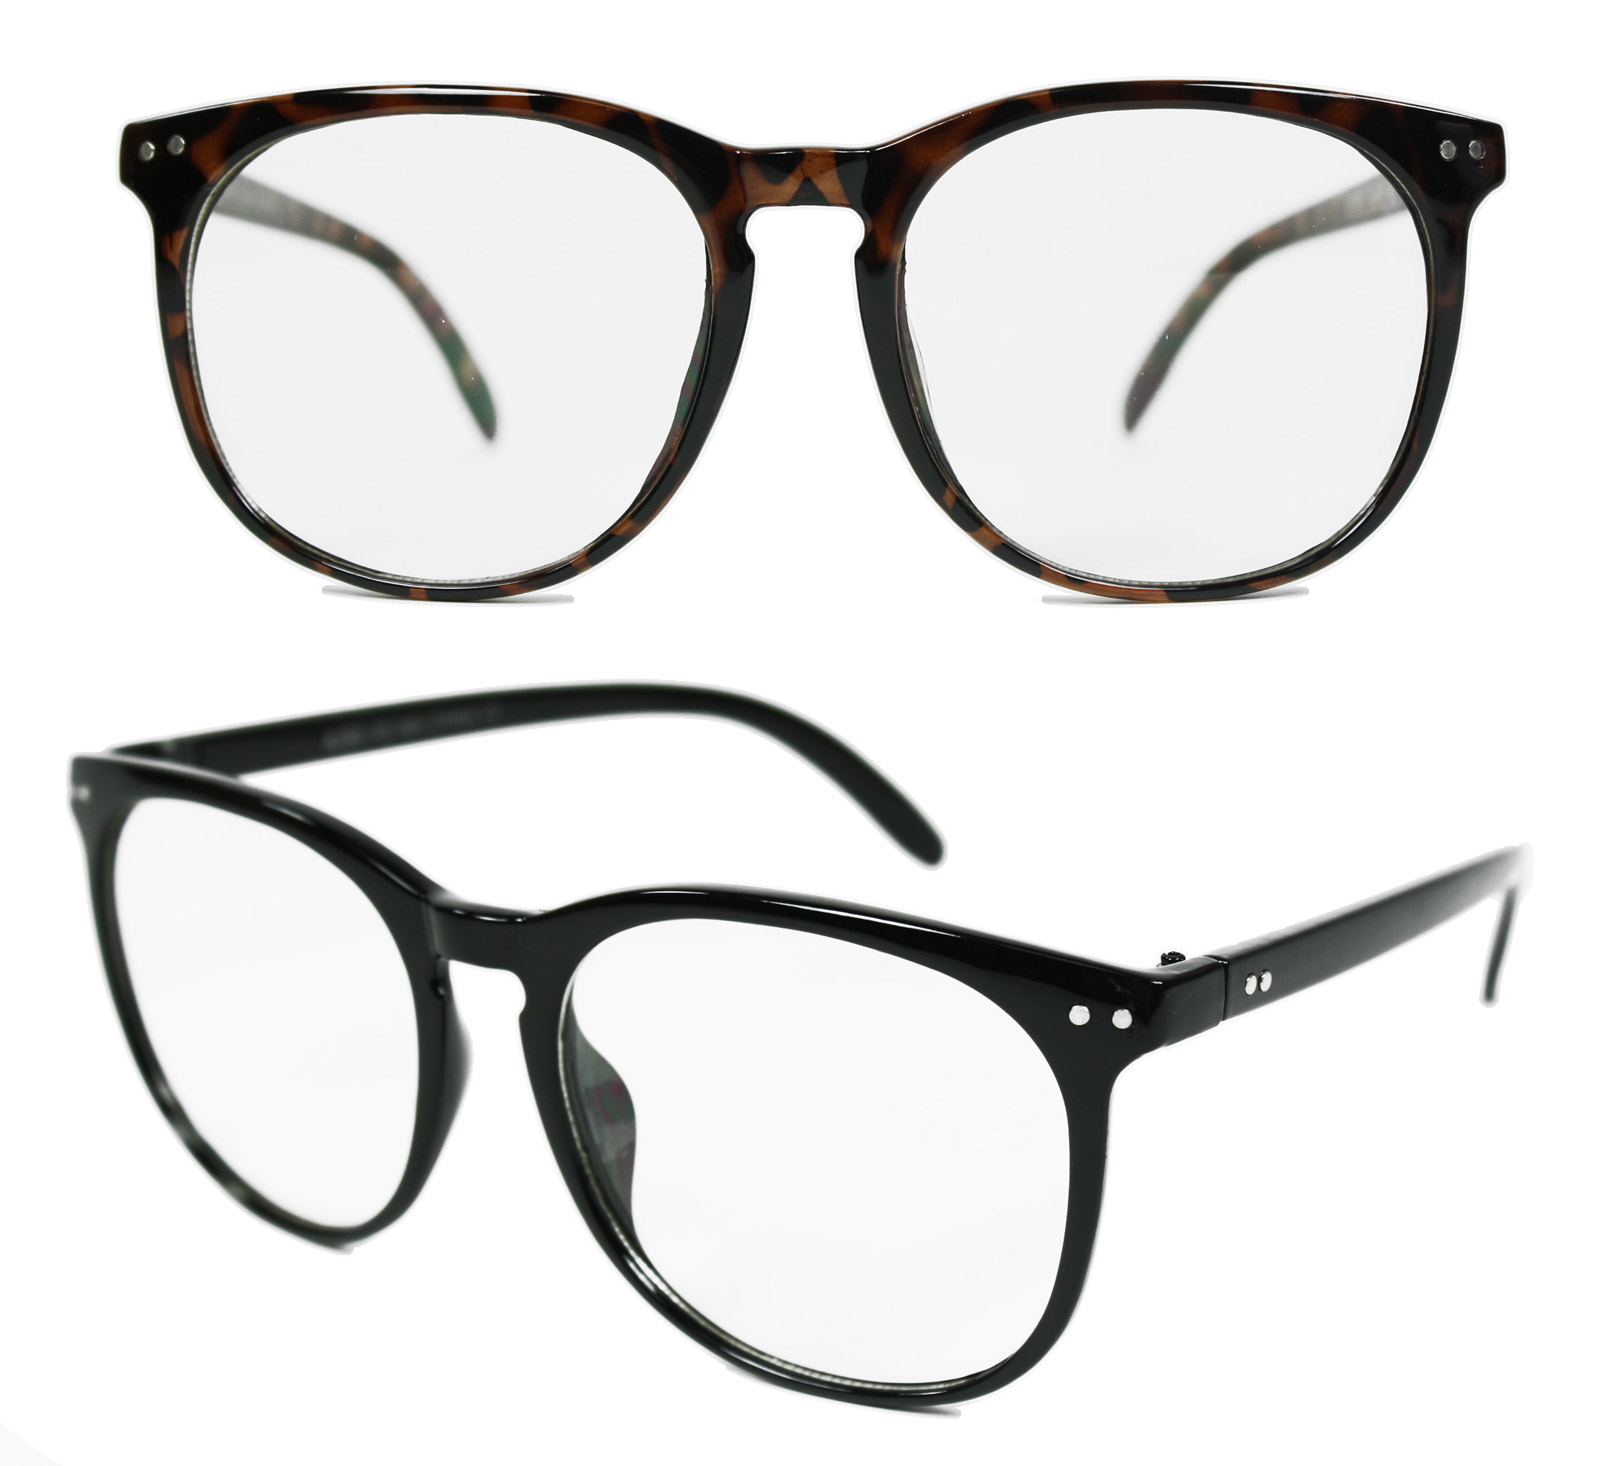 clark kent disguise superman clear lenses